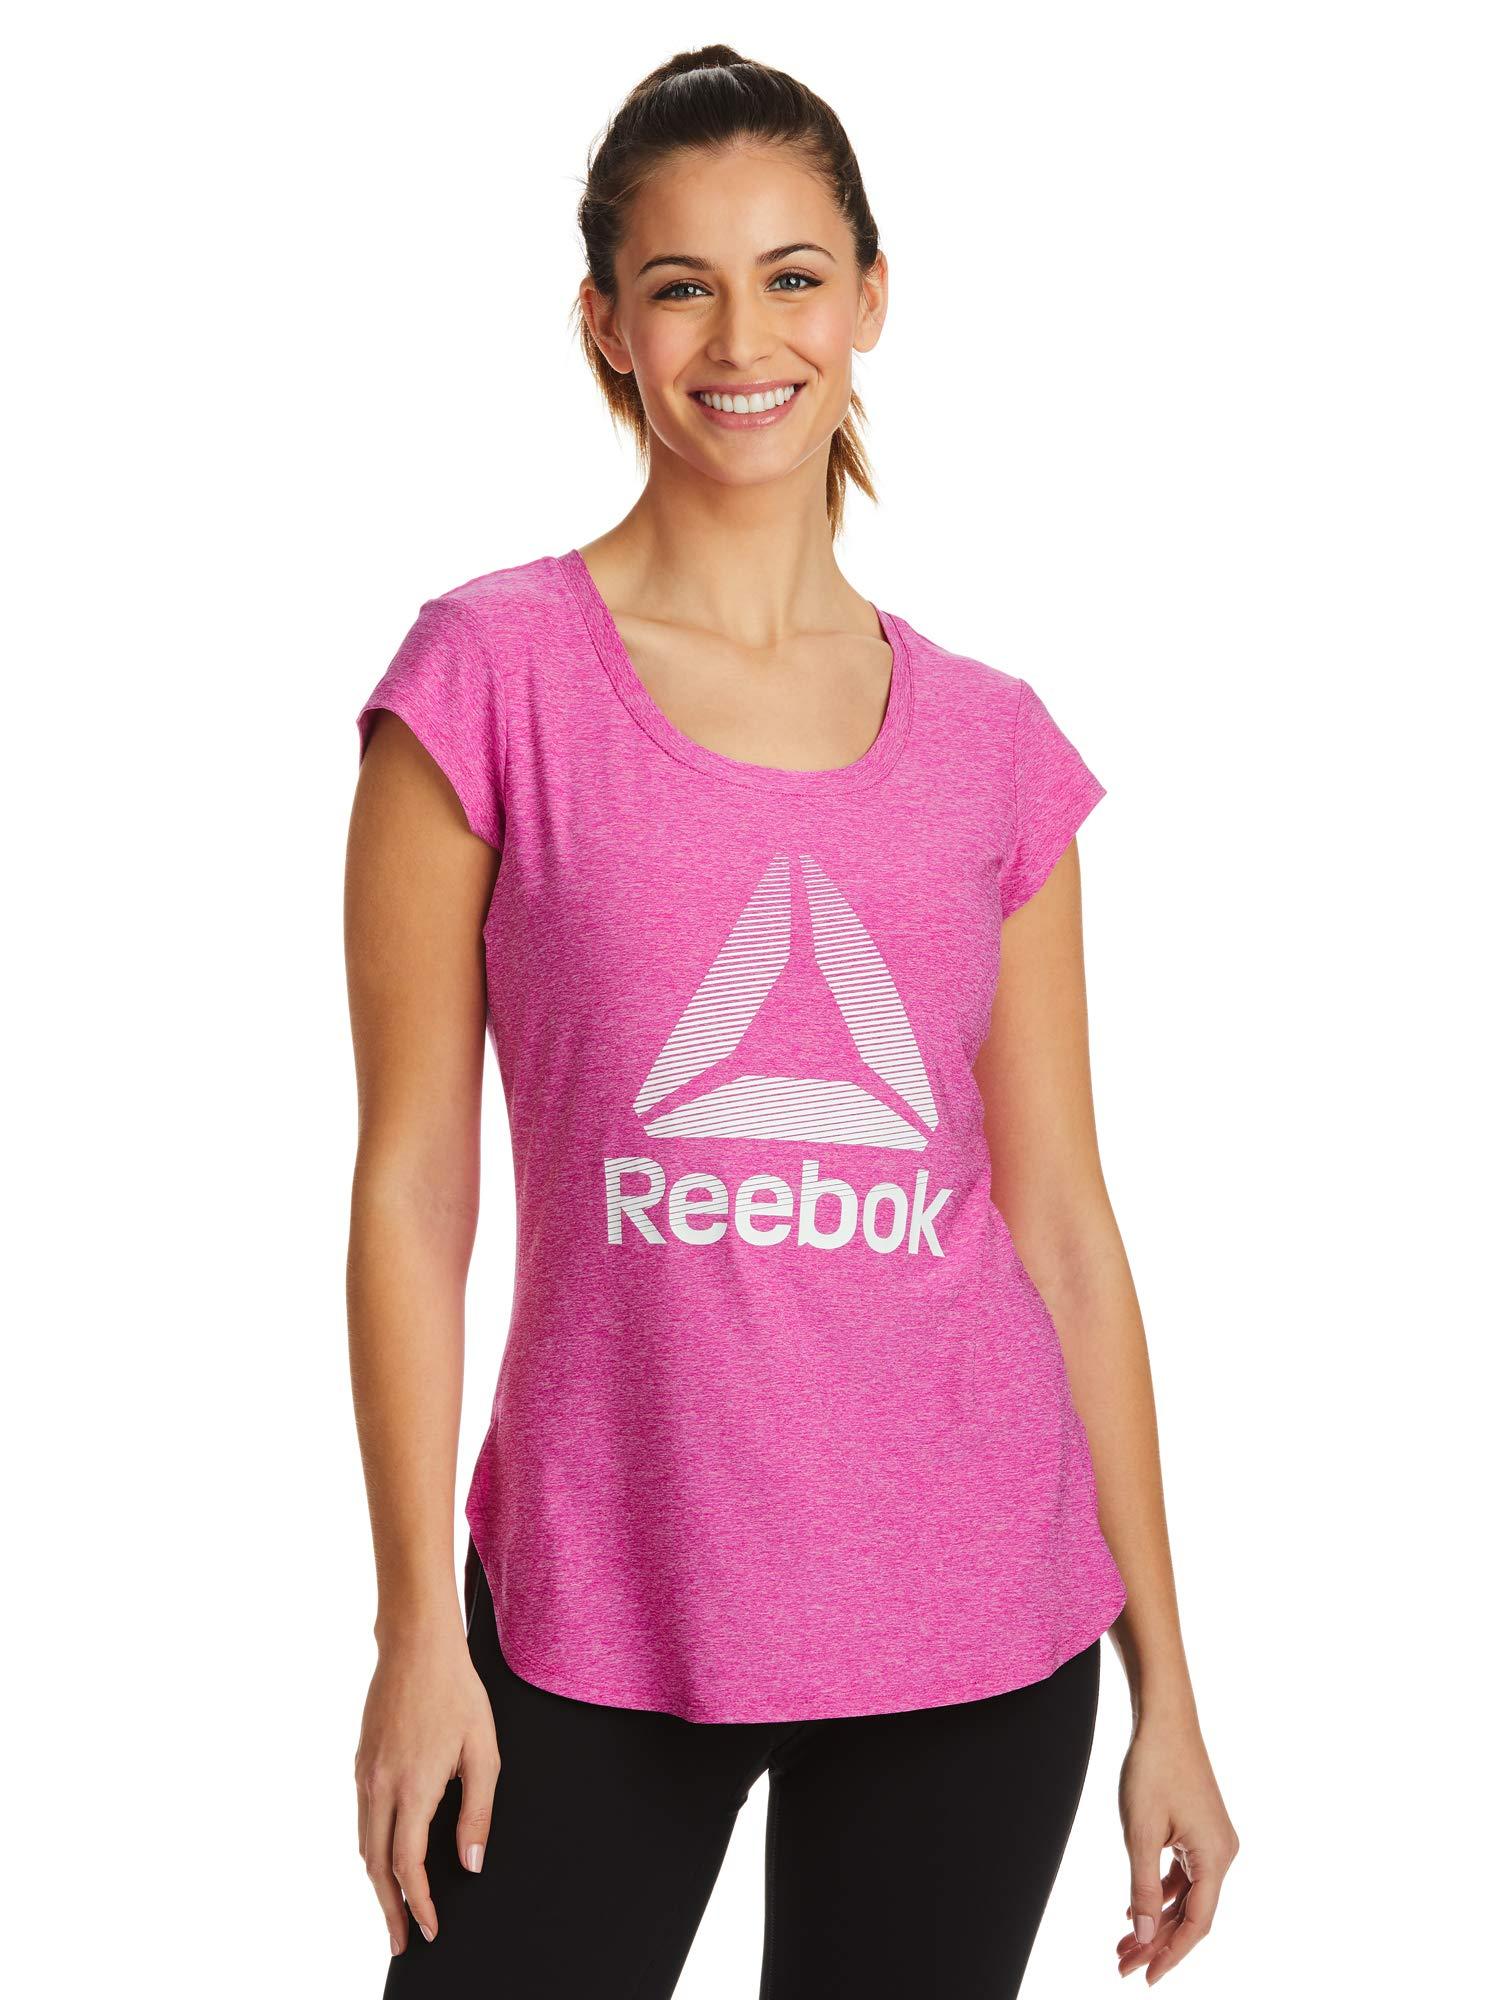 Reebok Women's Legend Performance Top Short Sleeve T-Shirt - Fuchsia Heather, Small by Reebok